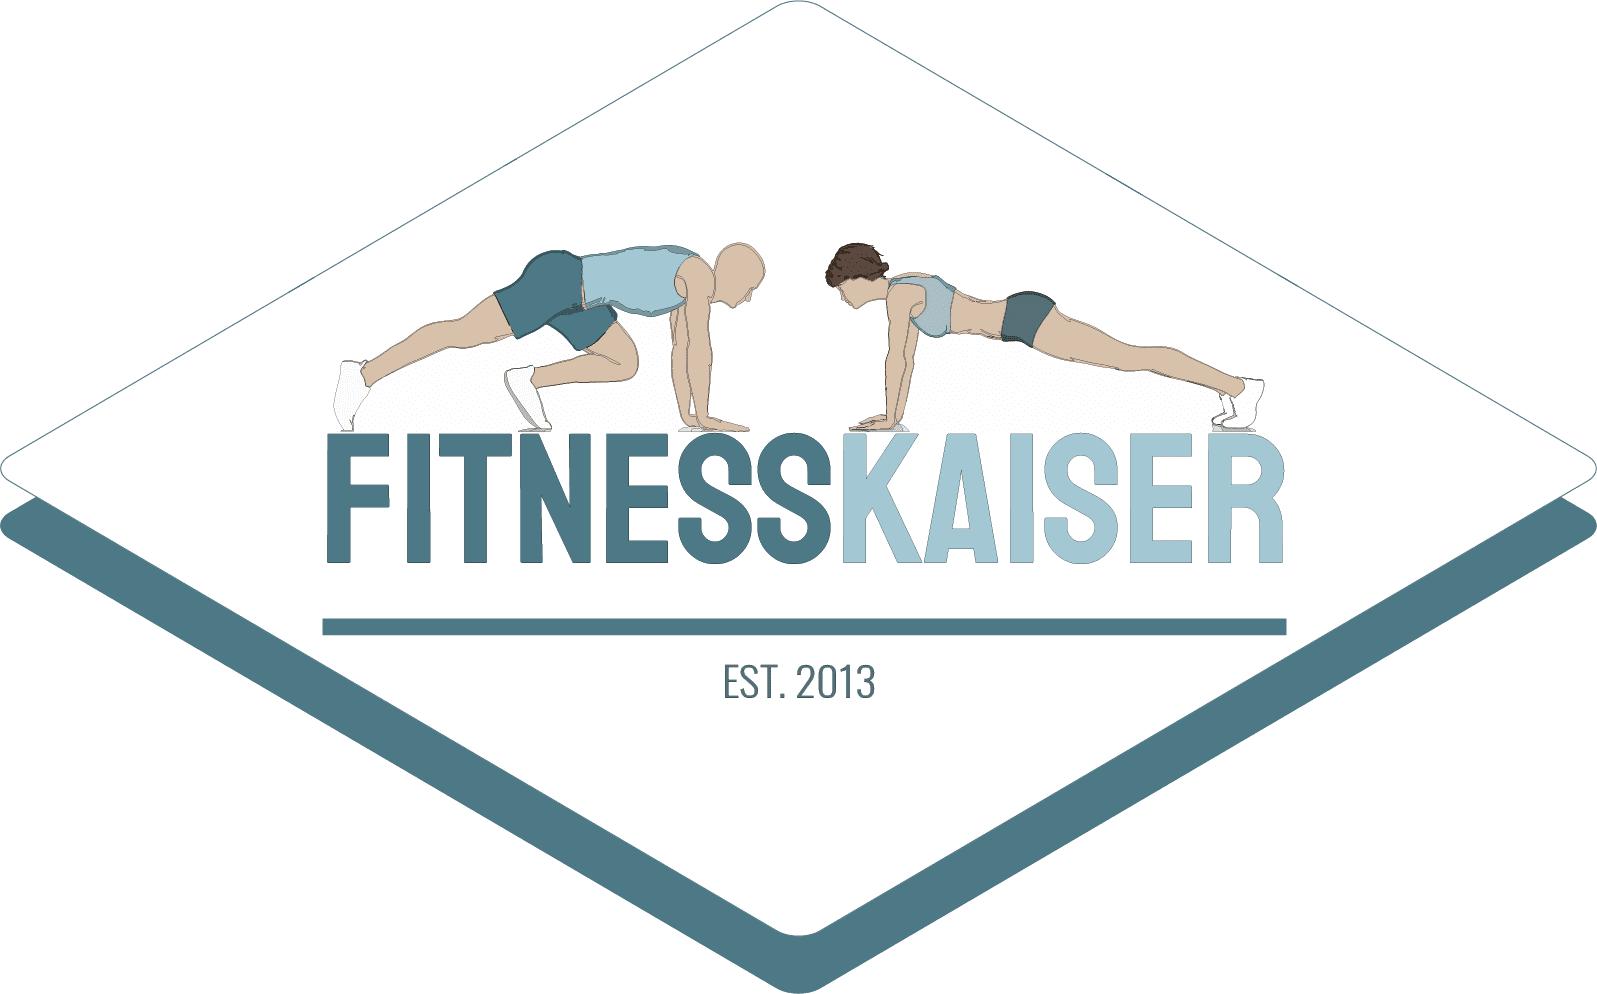 fitnesskaiser: Sporturlaub im Süden, Präventionskurse in Köln.